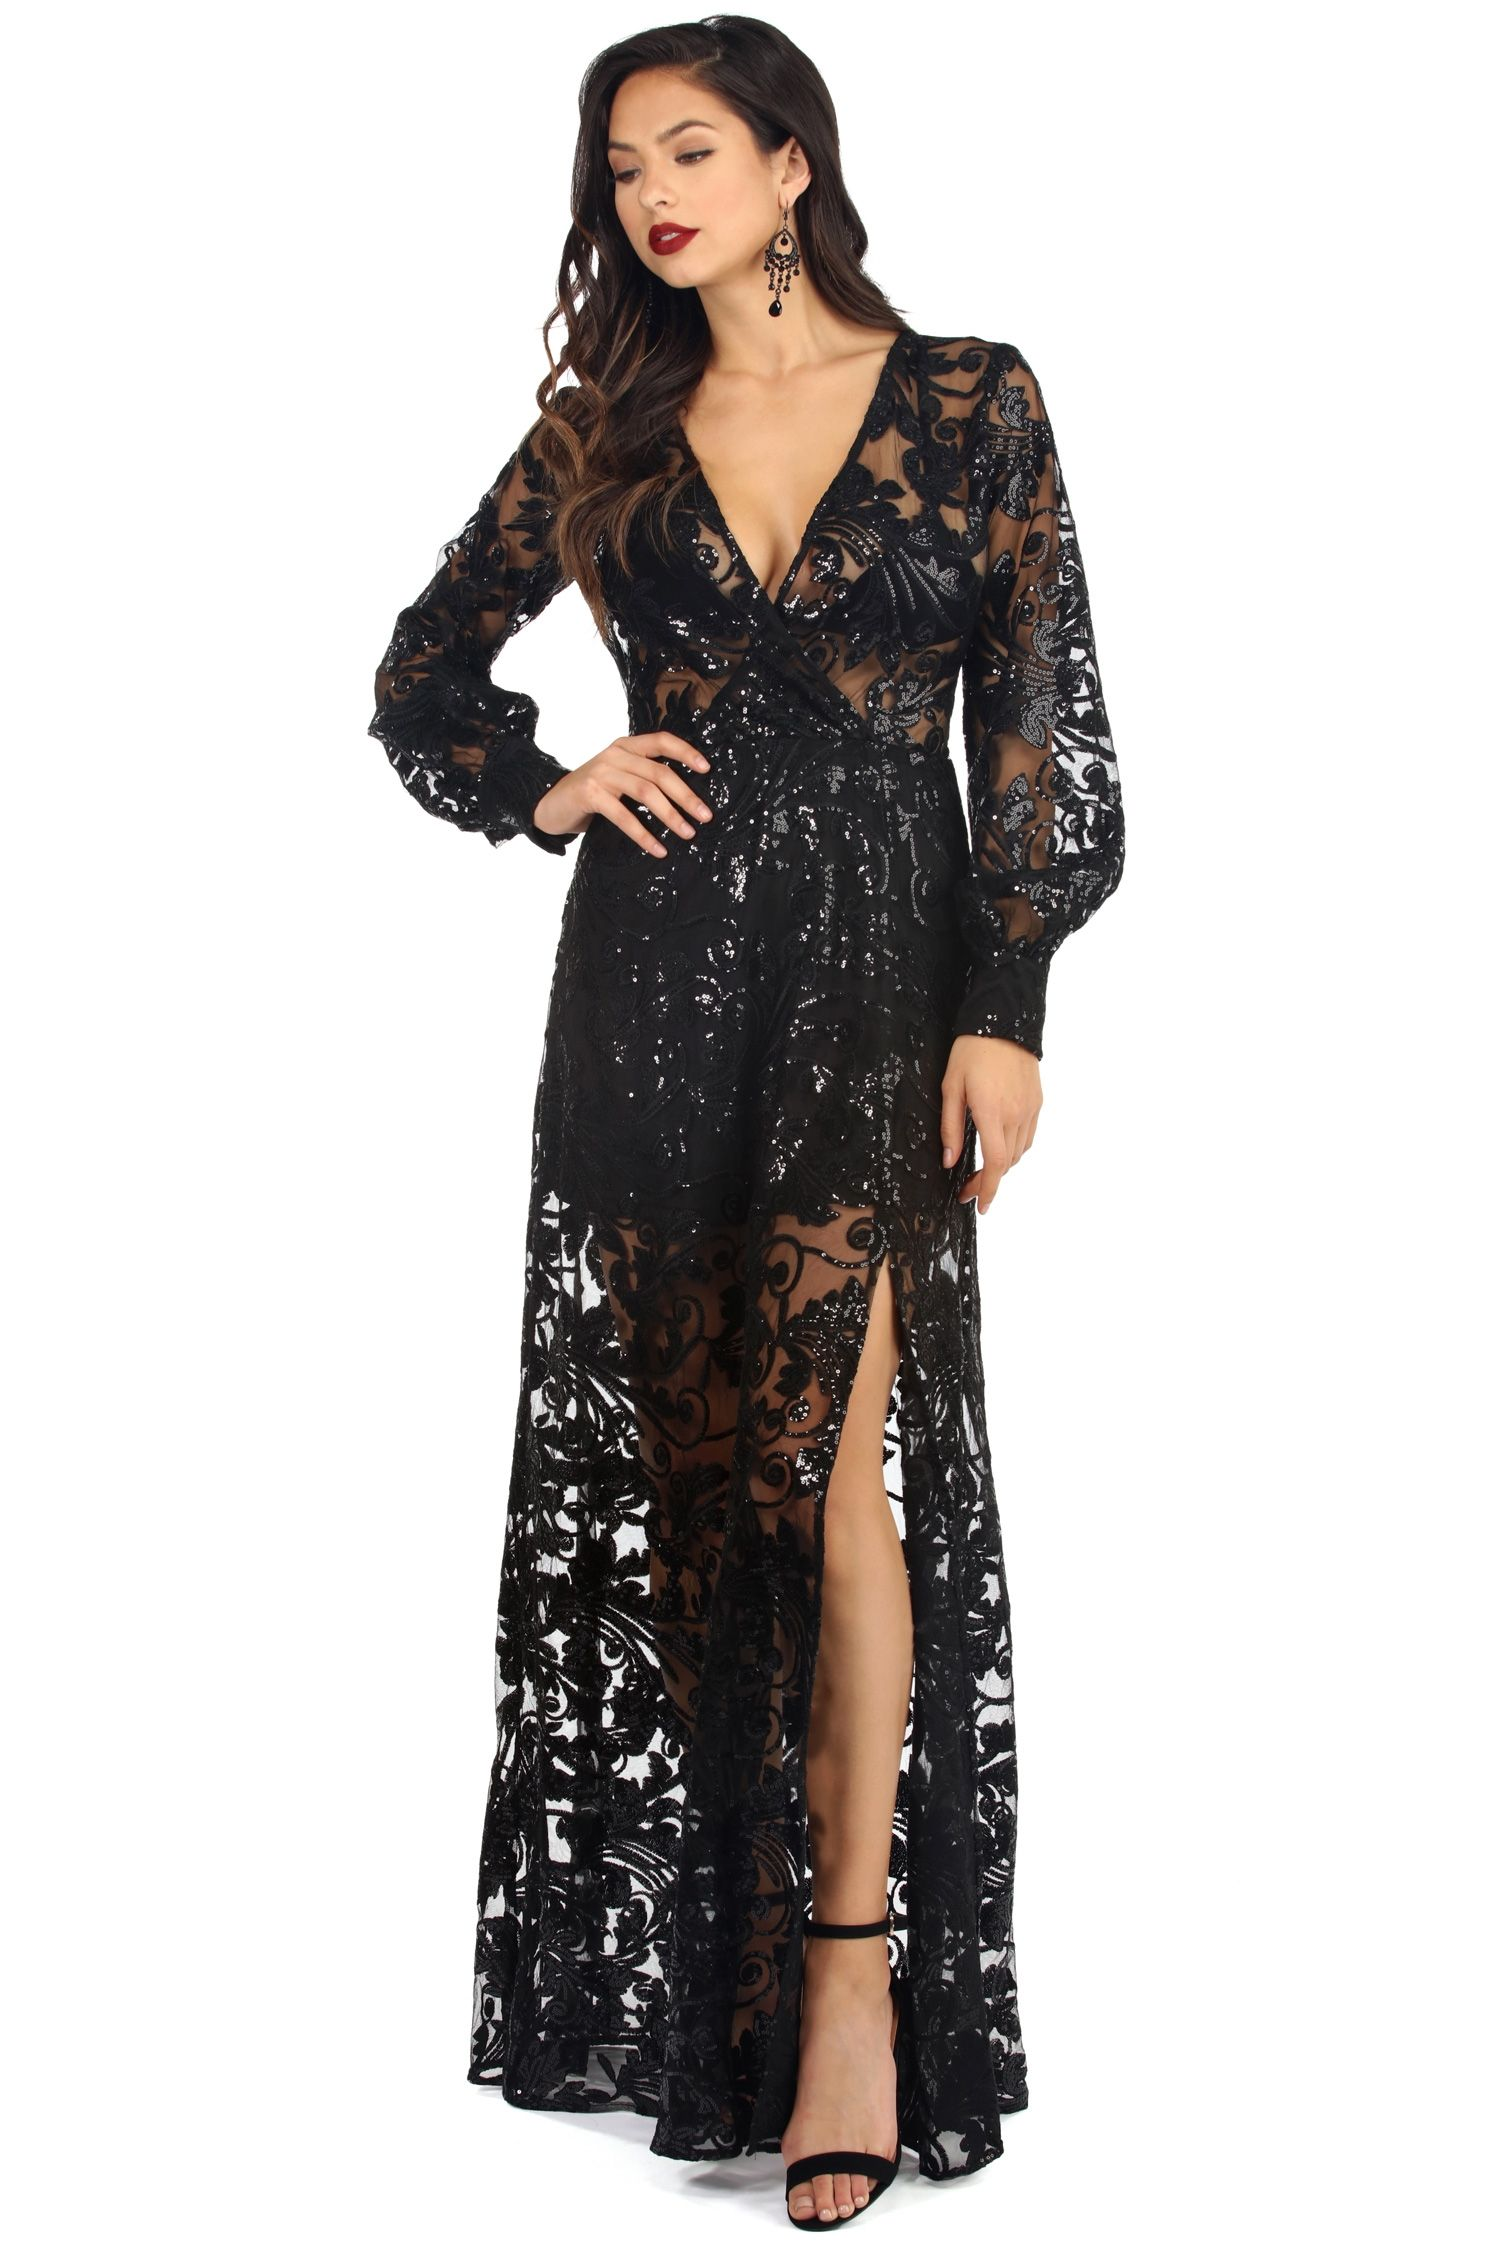 Long black backless lace dress windsor